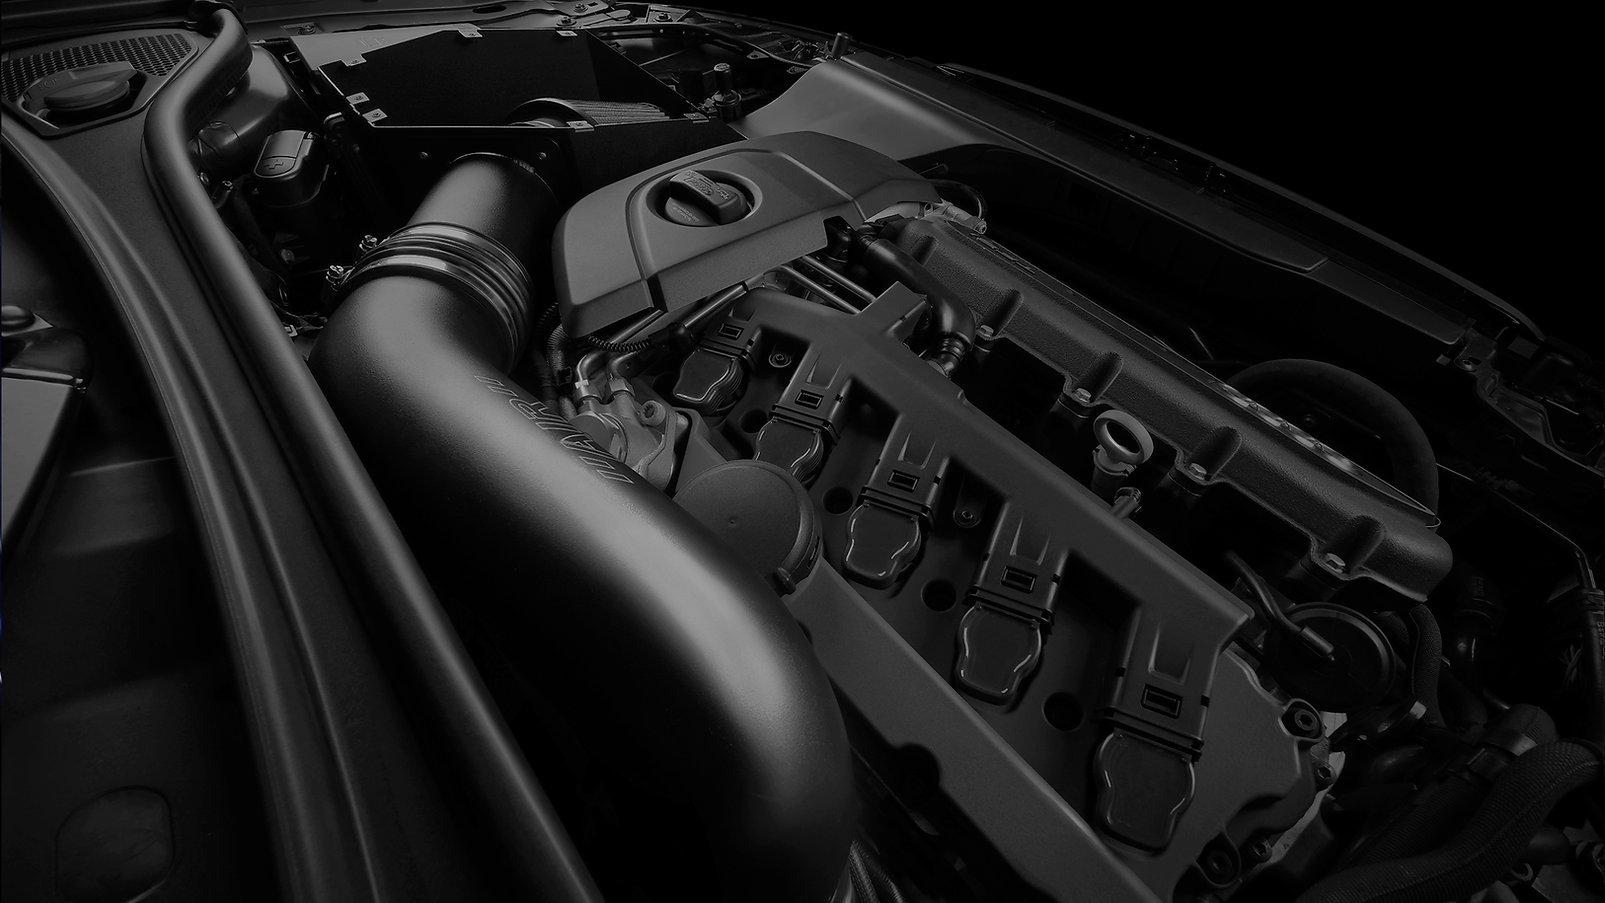 RS3 8V 4%22 Intake08-2.jpg